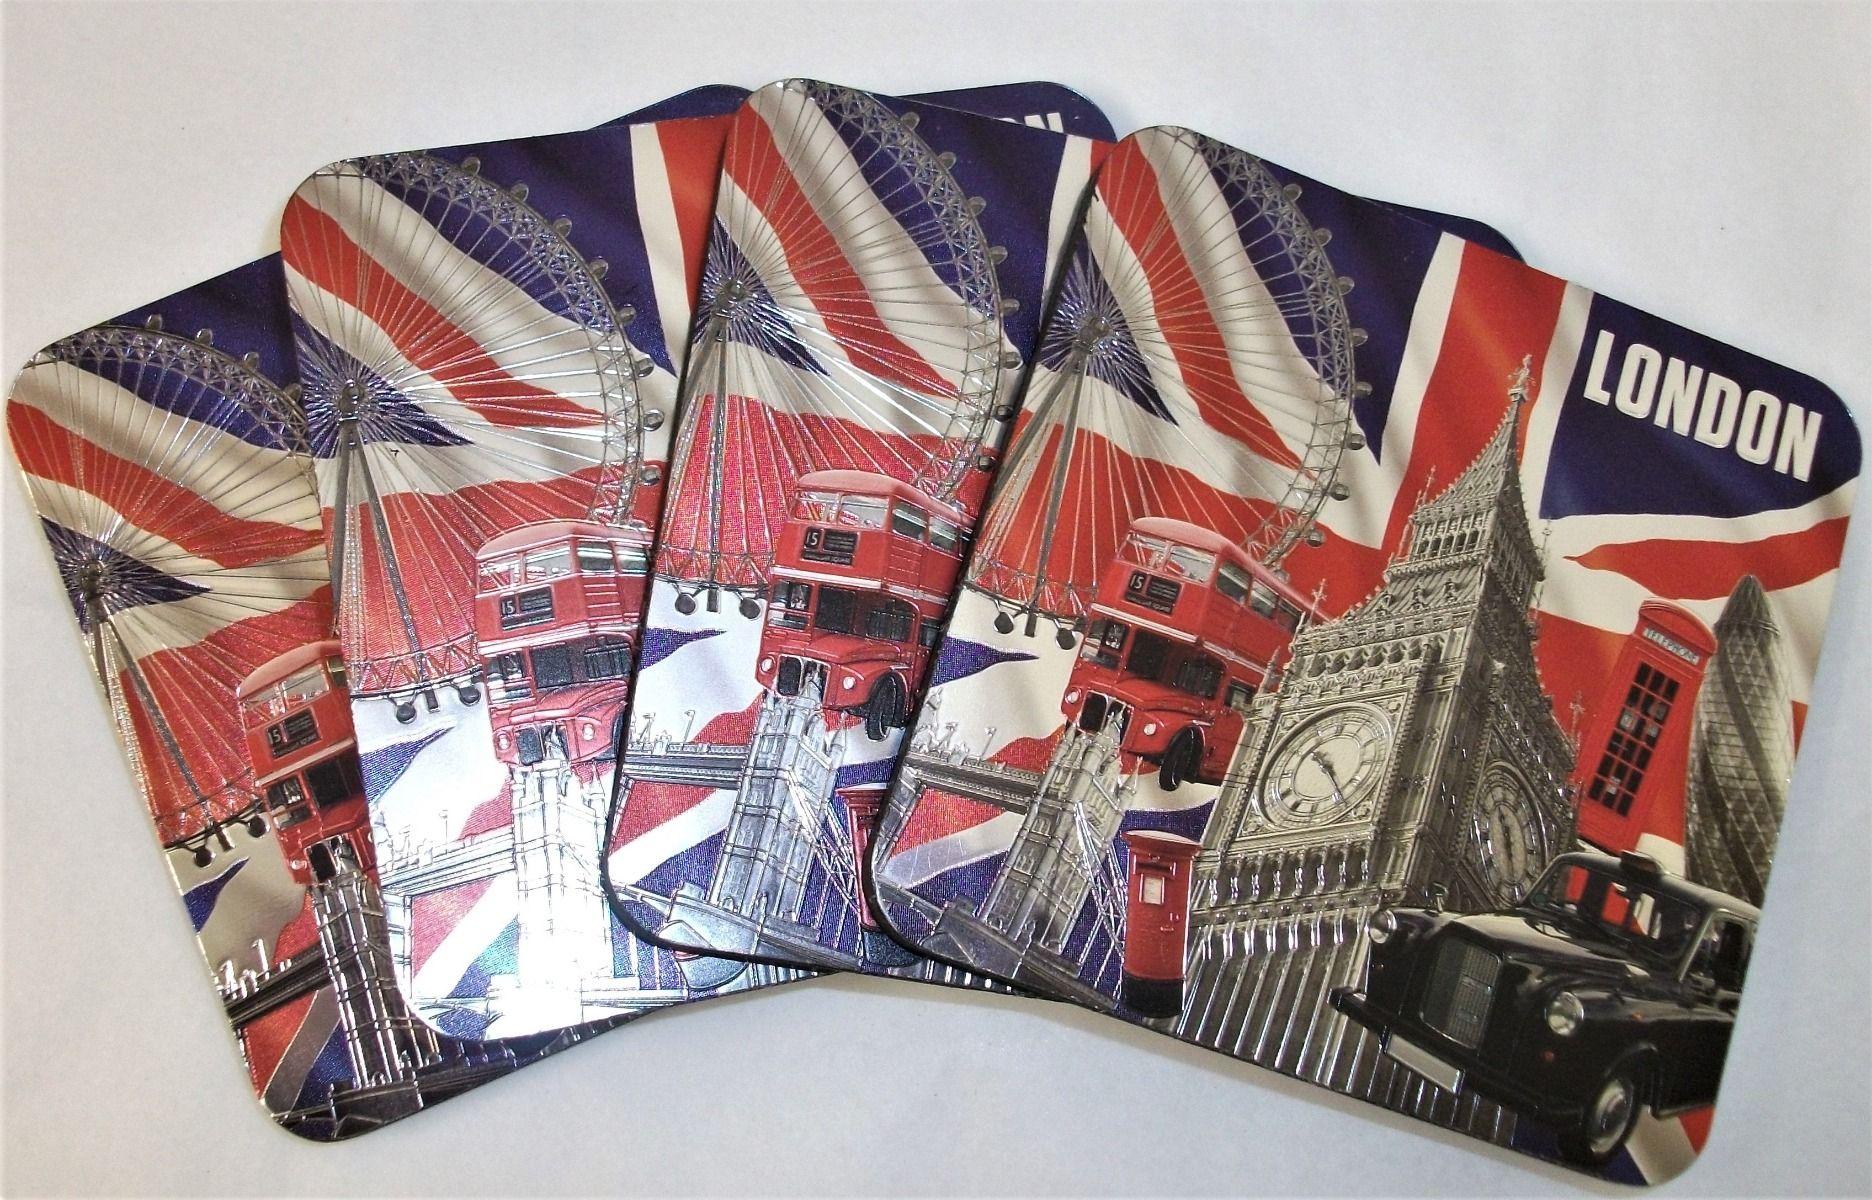 London 4 piece magnetic coaster set - Elgate 69467-000